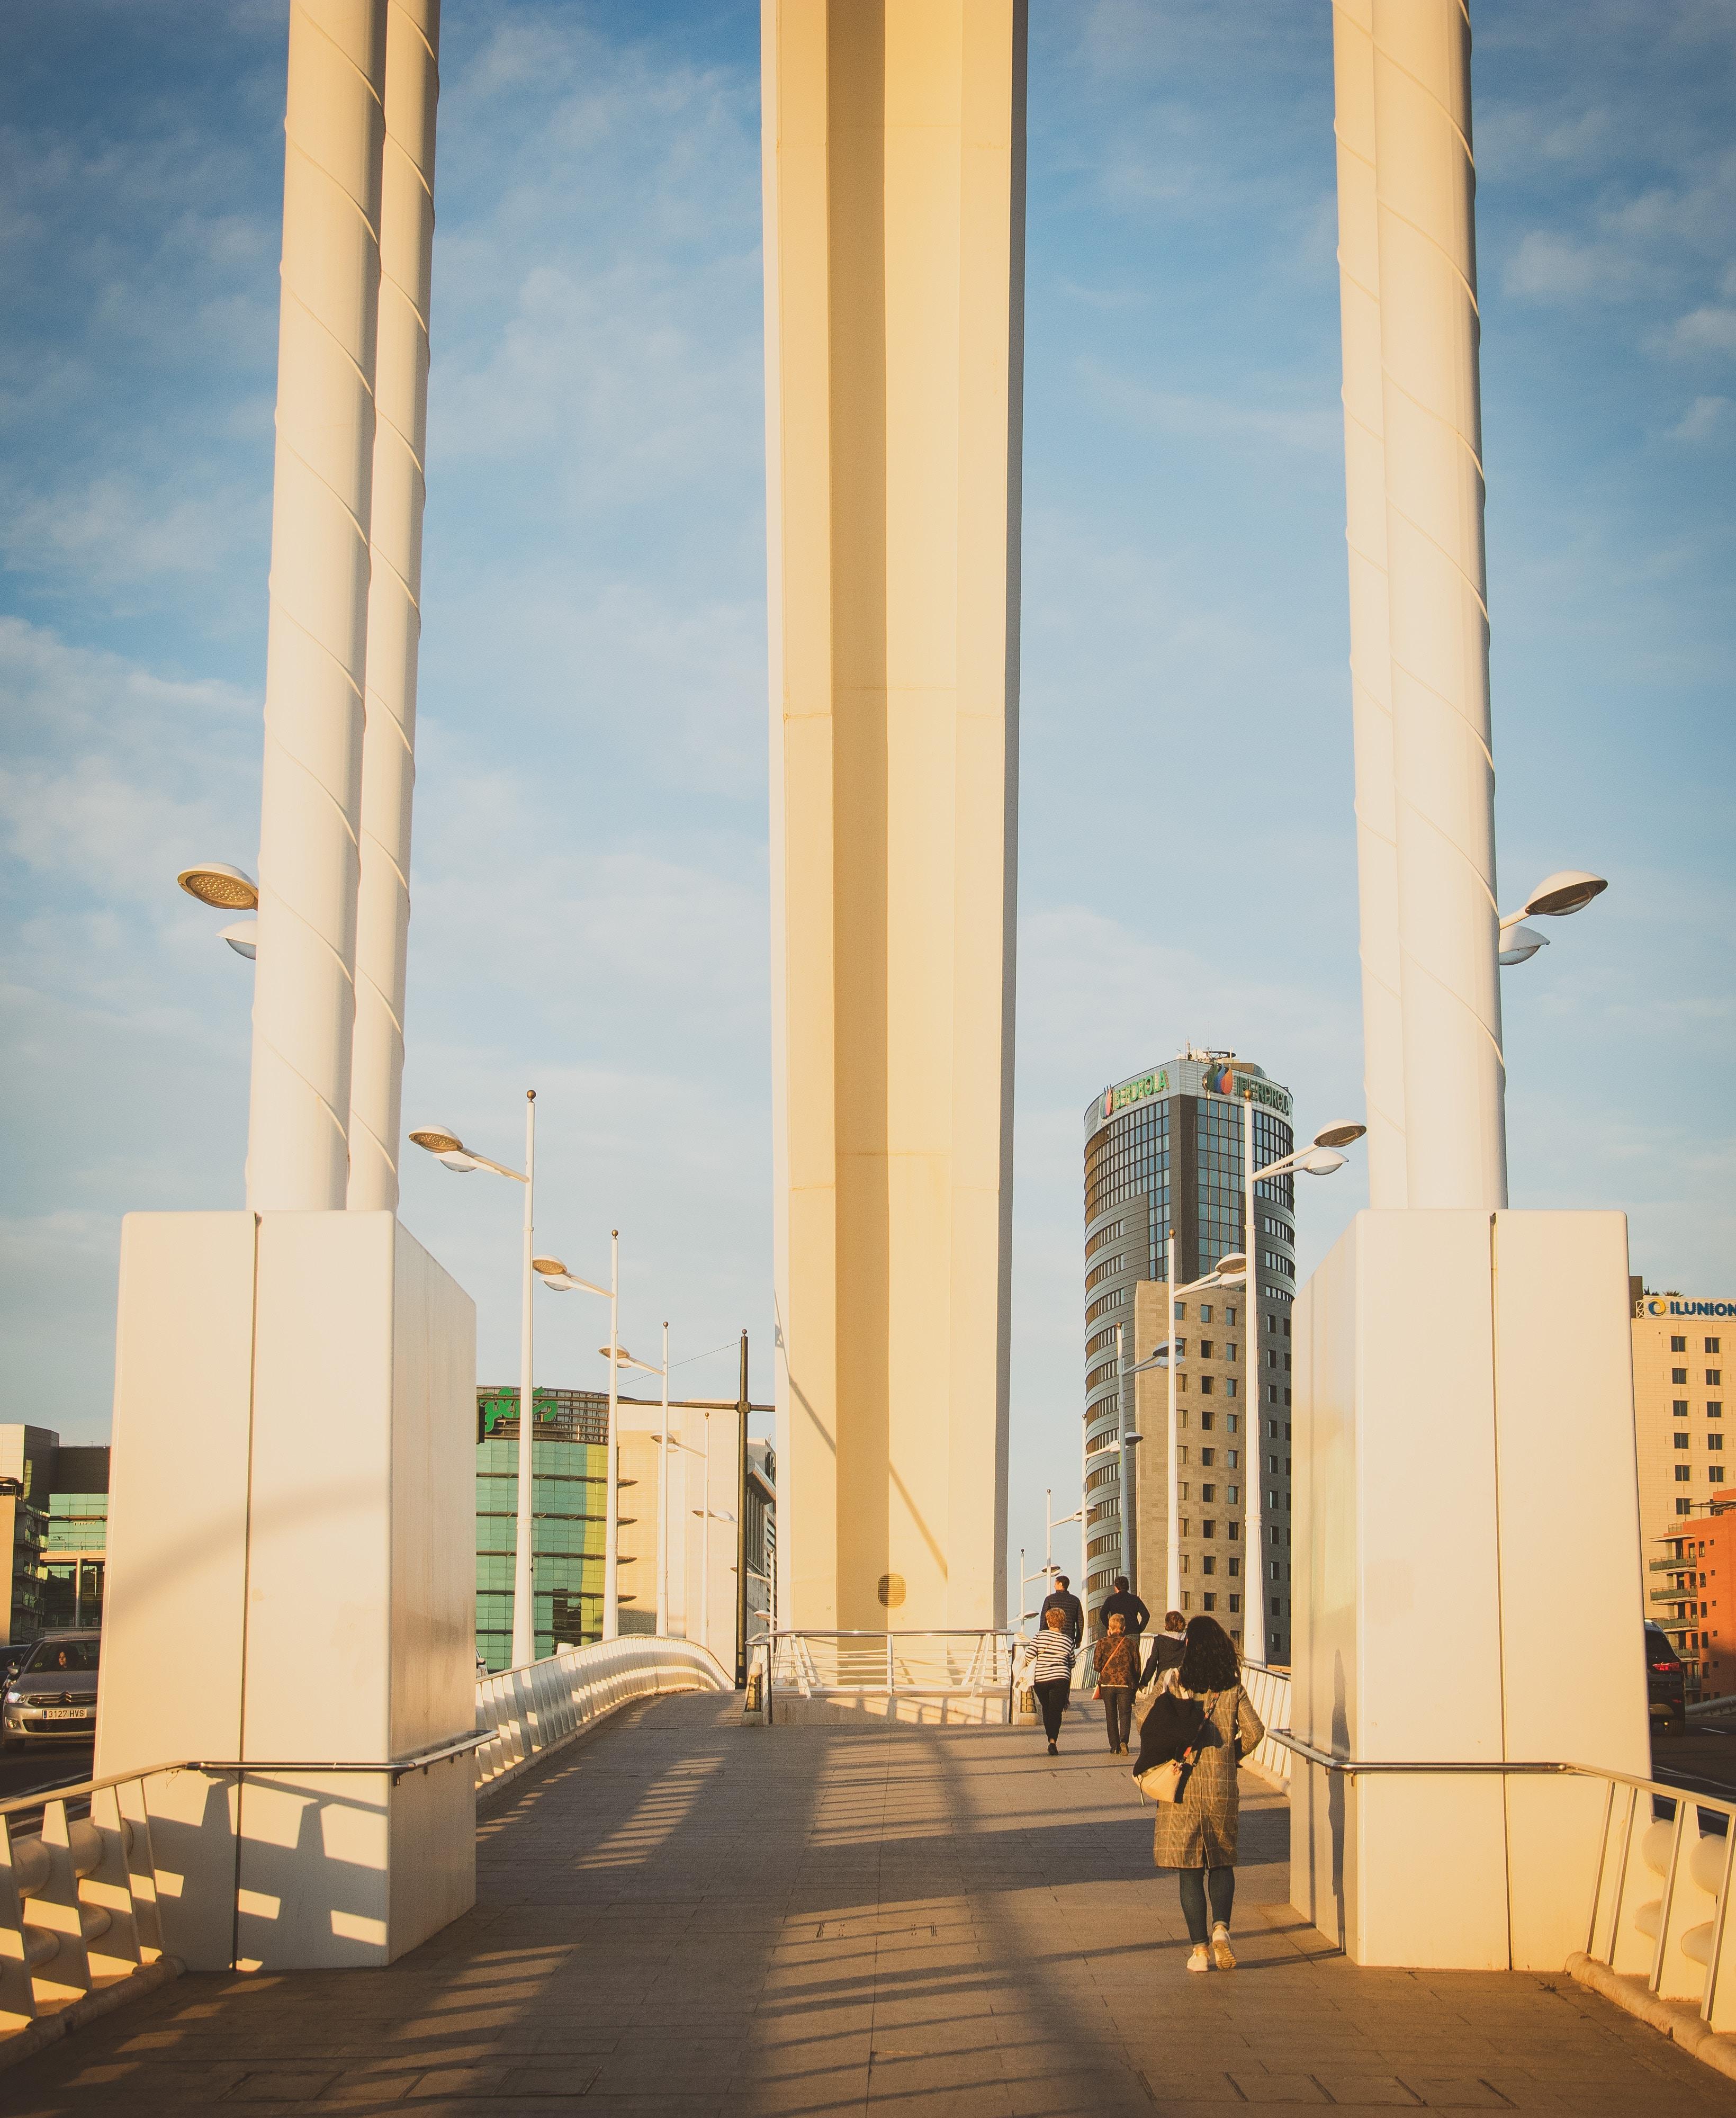 people walking on bridge near buildings during daytime